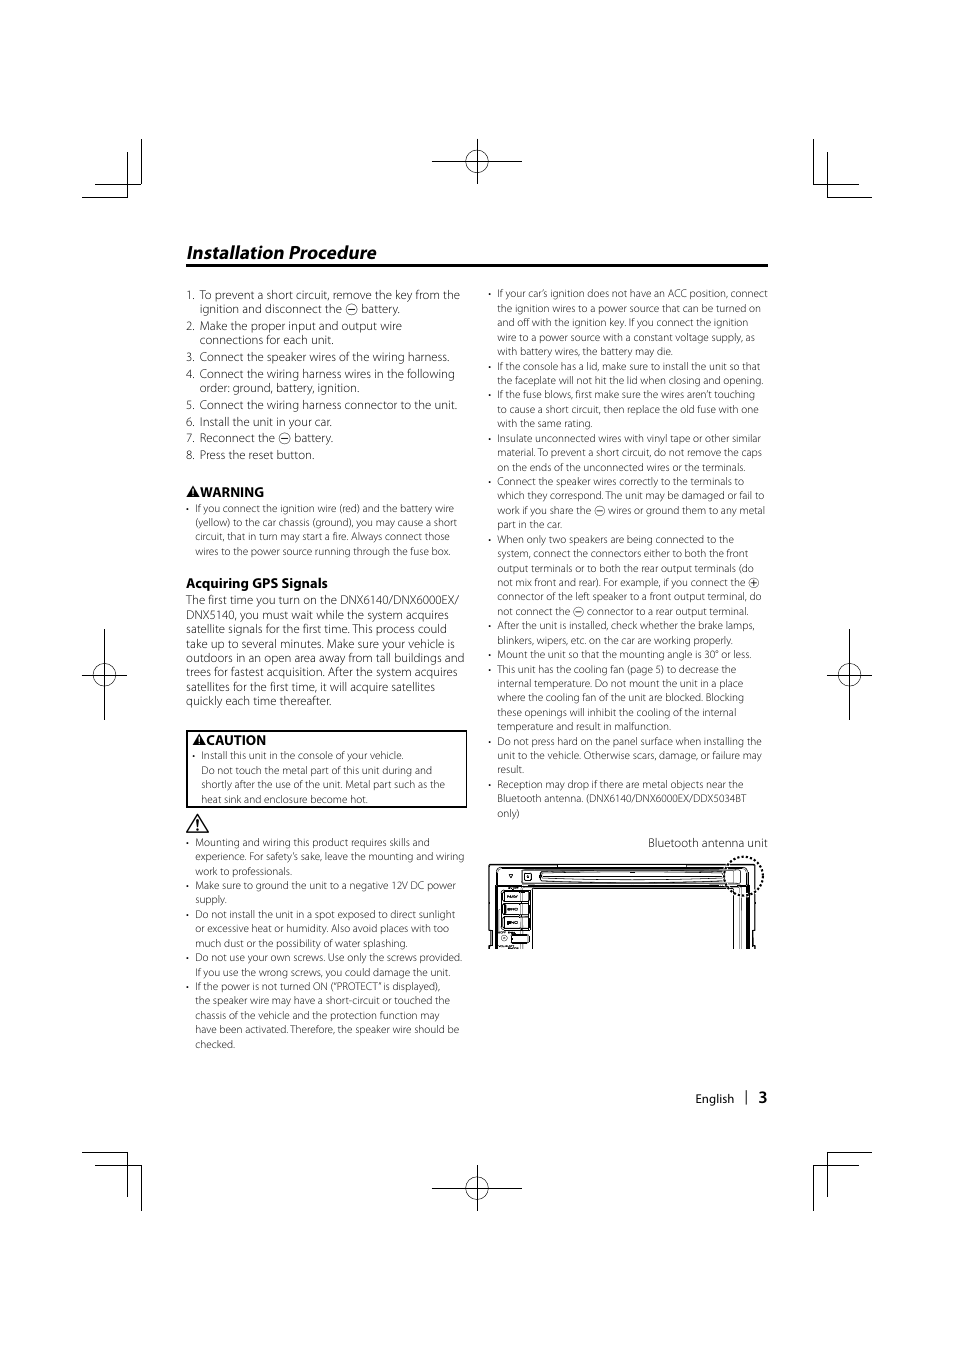 installation procedure kenwood ddx5034 user manual page 3 32 rh manualsdir com Kenwood DNX5140 Manual Installation Owner's Manual Kenwood DNX6140